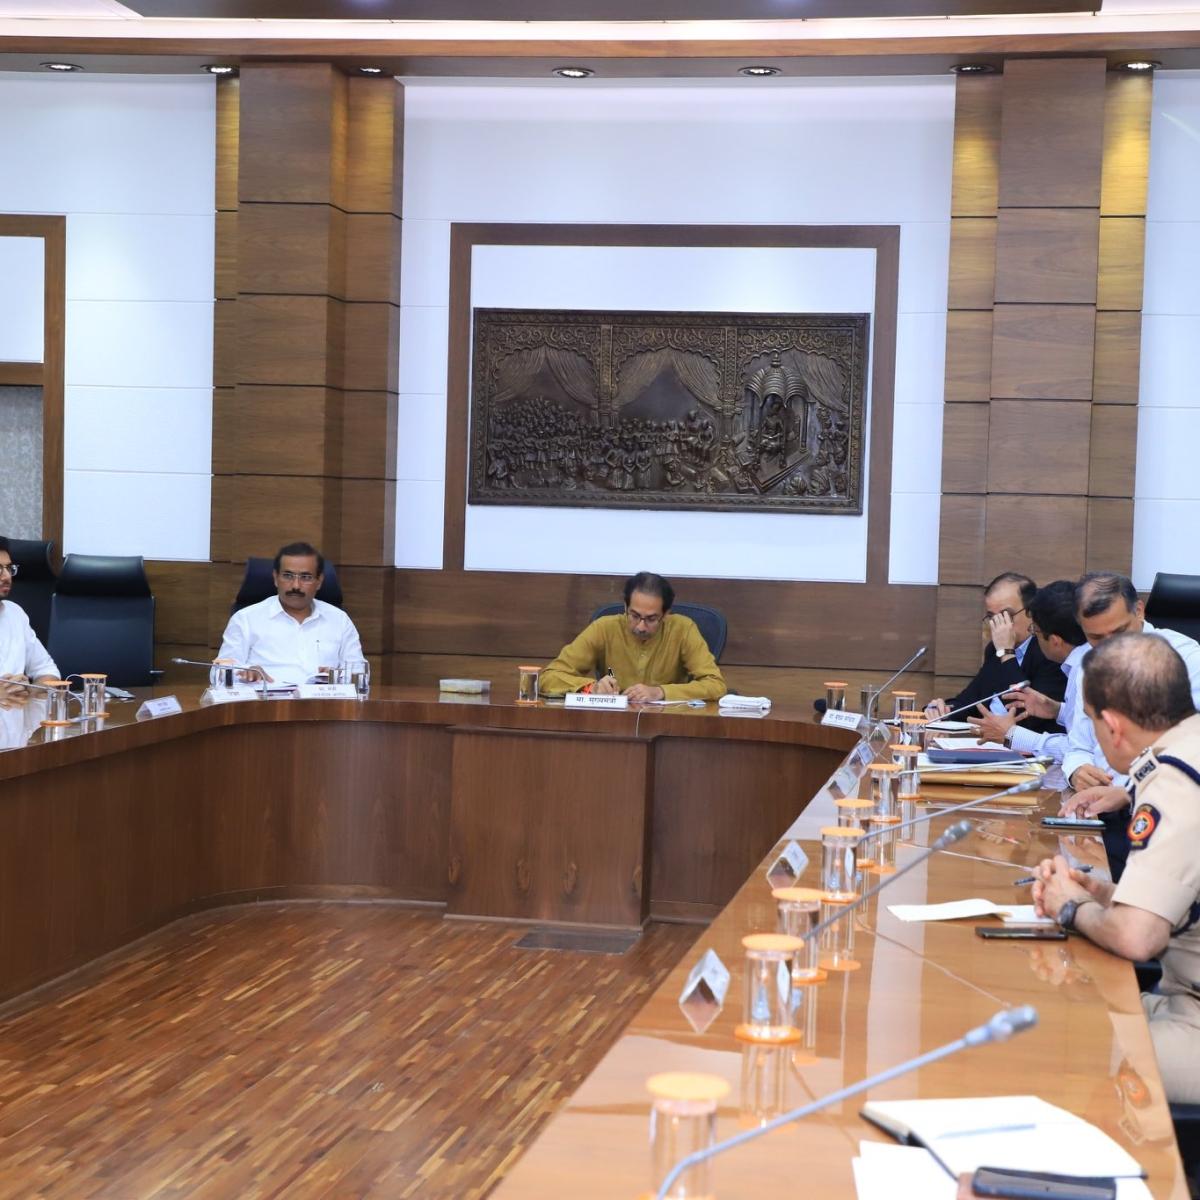 Coronavirus update in Maharashtra: Uddhav Thackeray, Labour Commissioner bat for contract and casual workers amid coronavirus restrictions